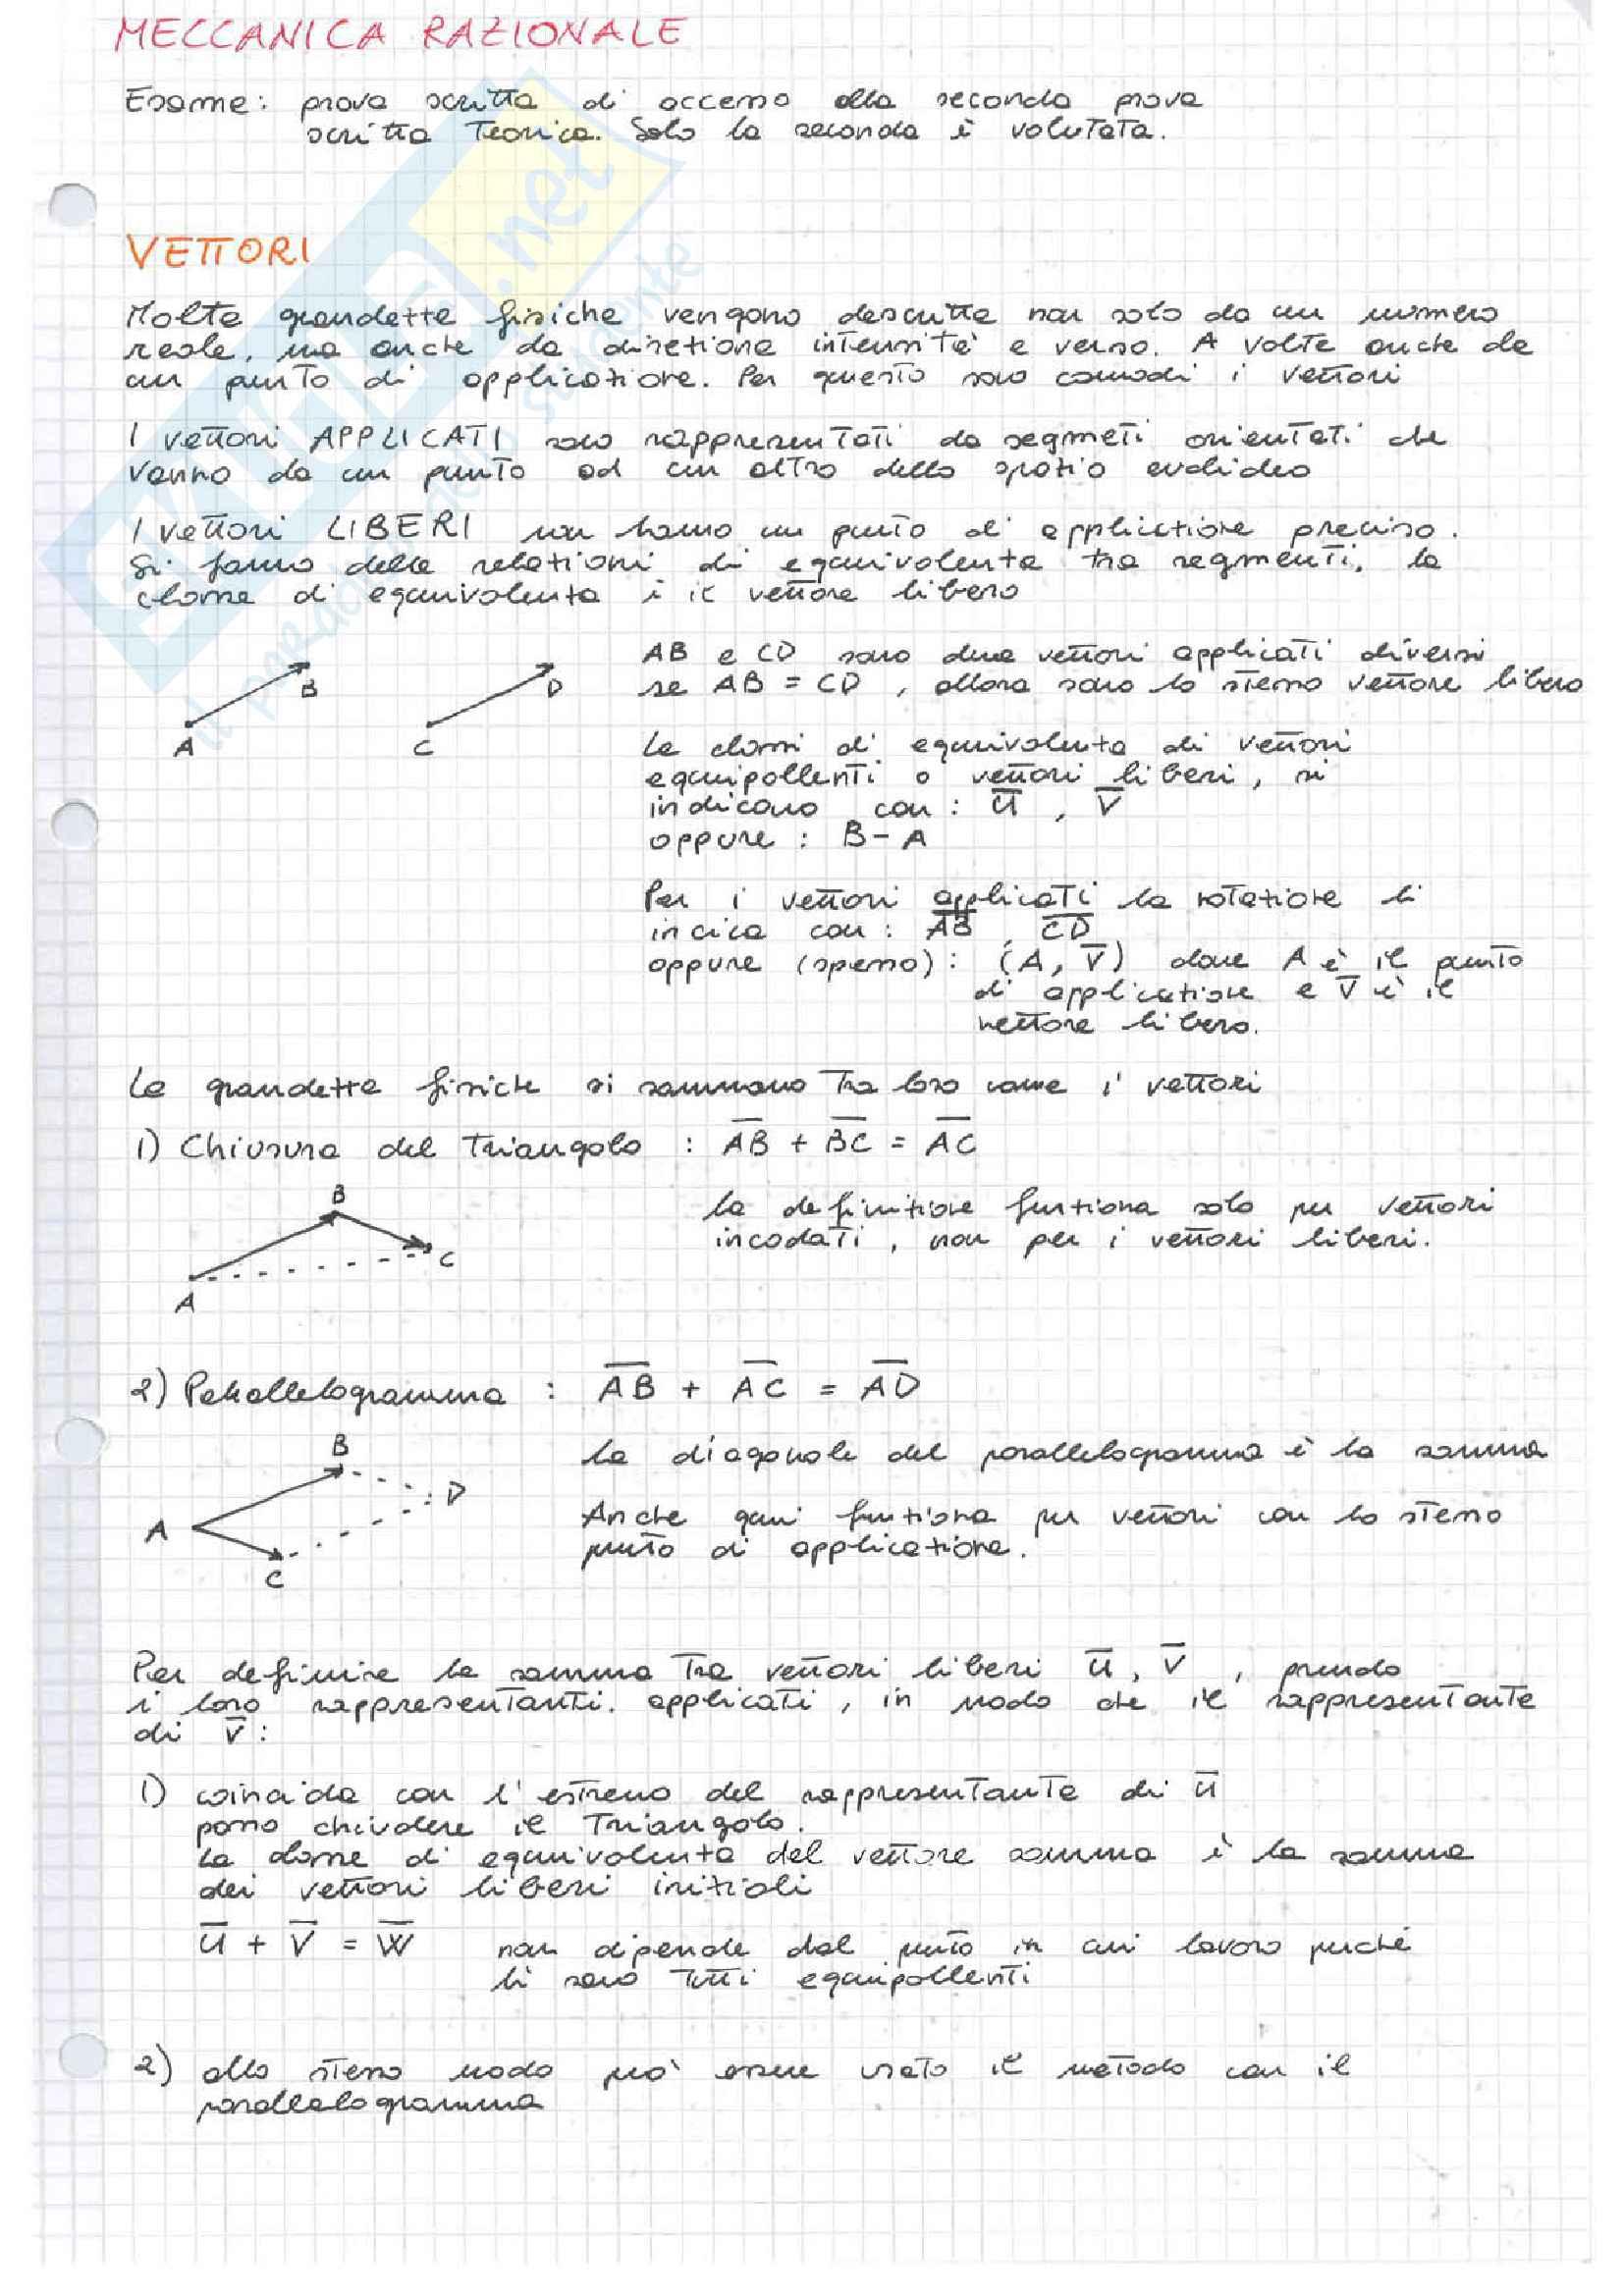 Appunti, Esercizi e Prove d'esame Meccanica Razionale